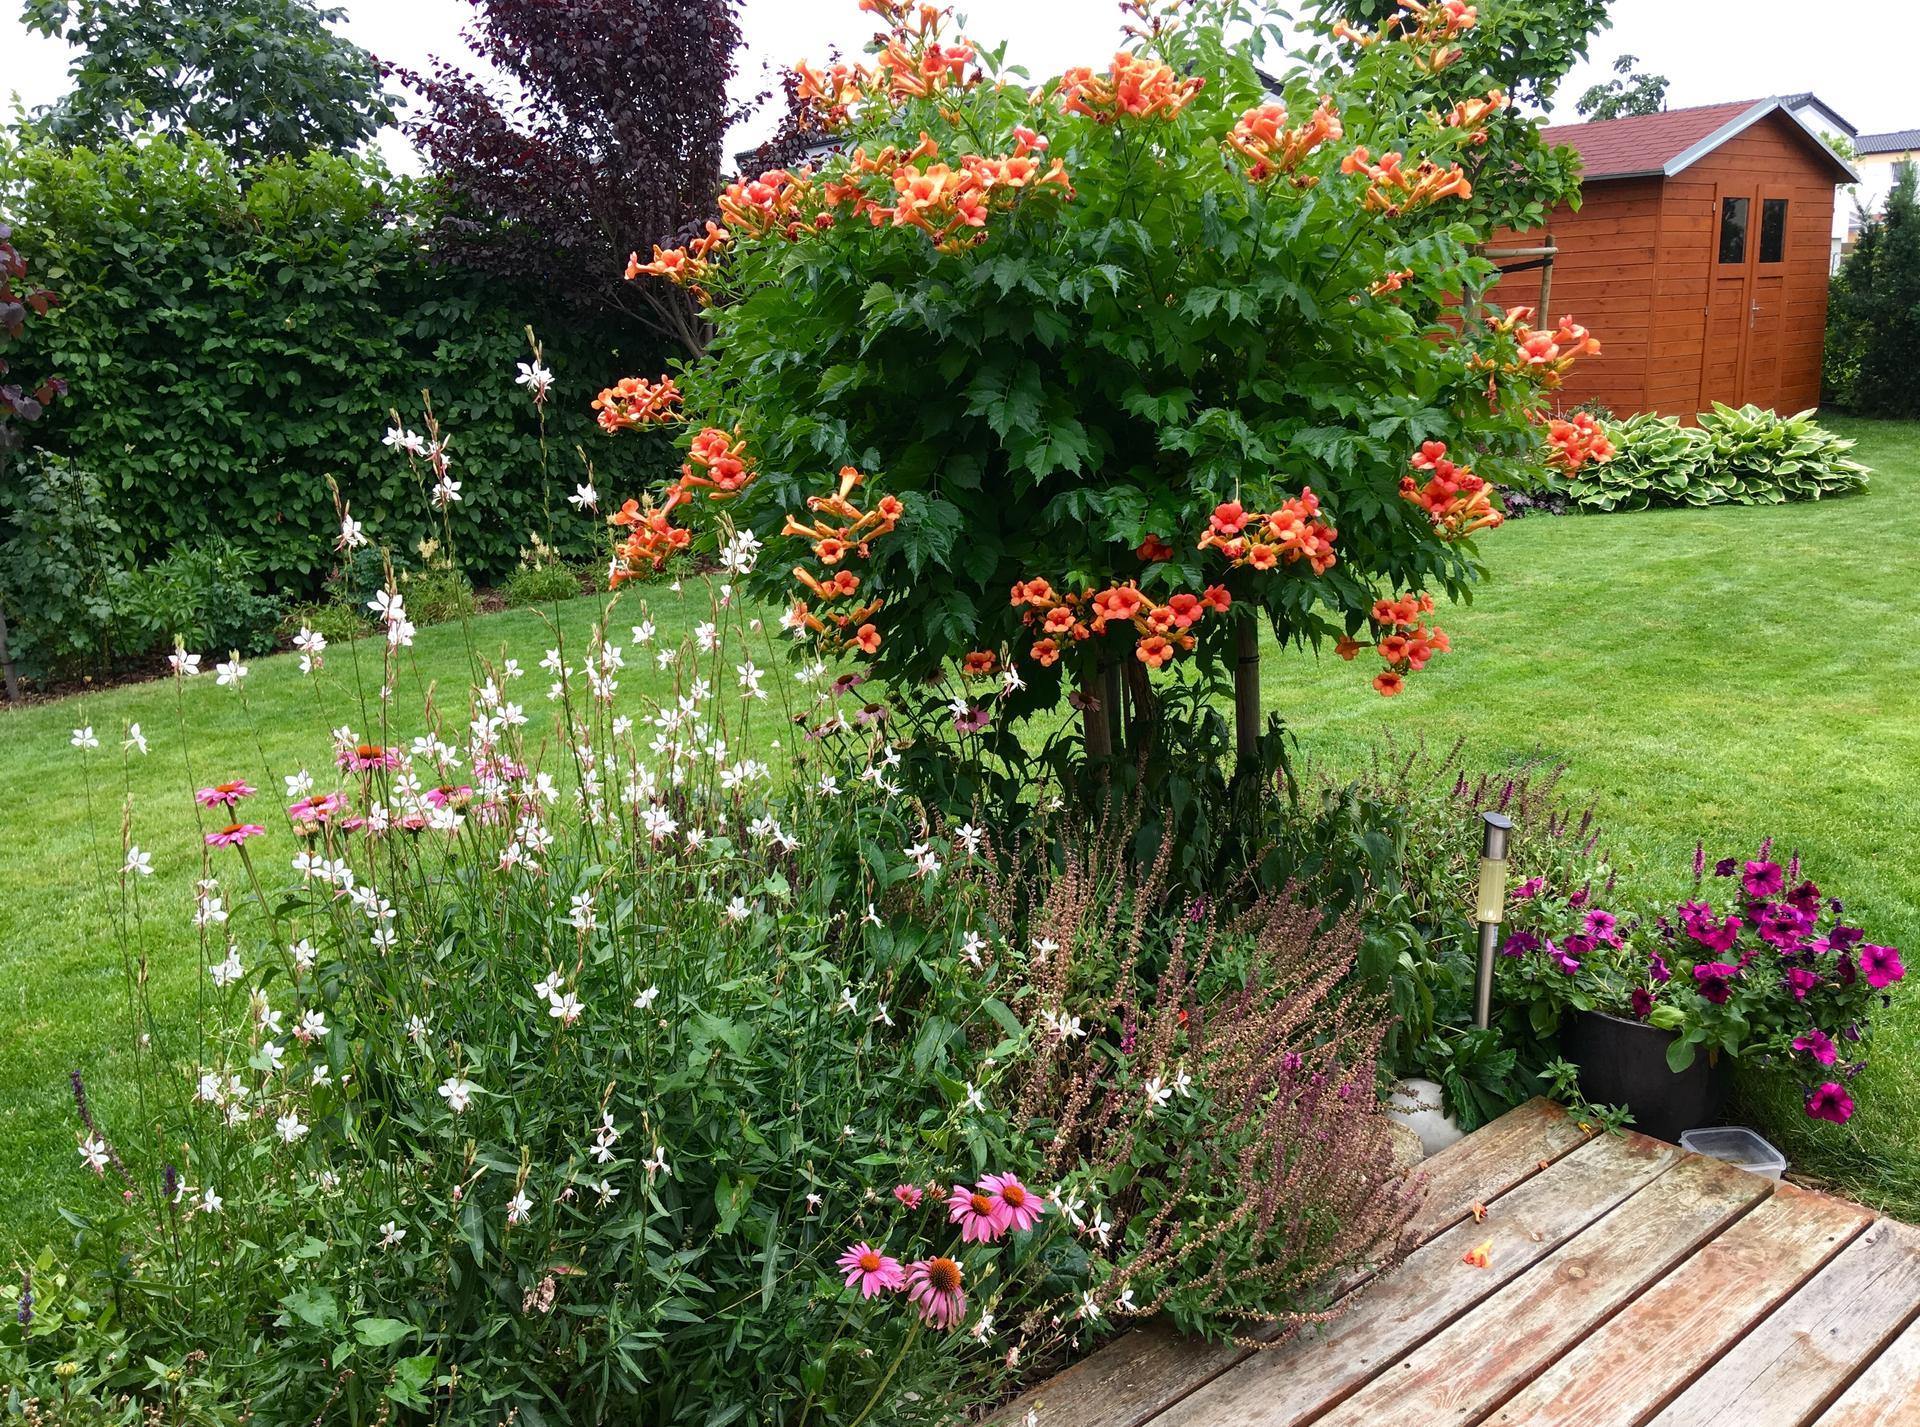 Zahrada 2020 - A to je ten zahradni domek- popinat se bude bok, je to pohledova zona z terasy...